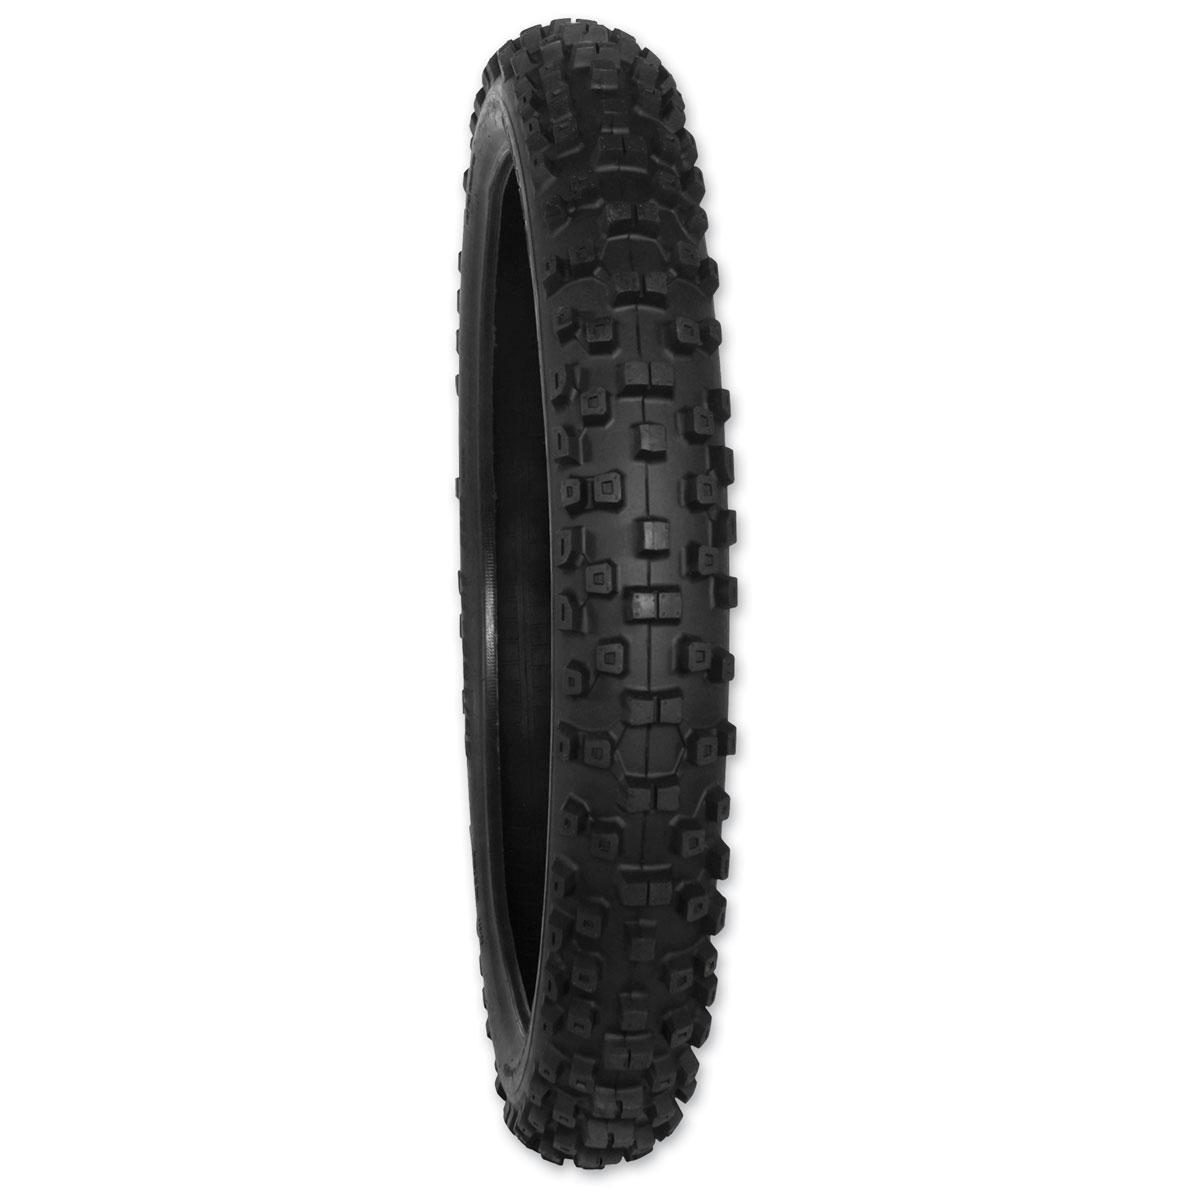 Duro DM1156 80/100-21 Front Tire